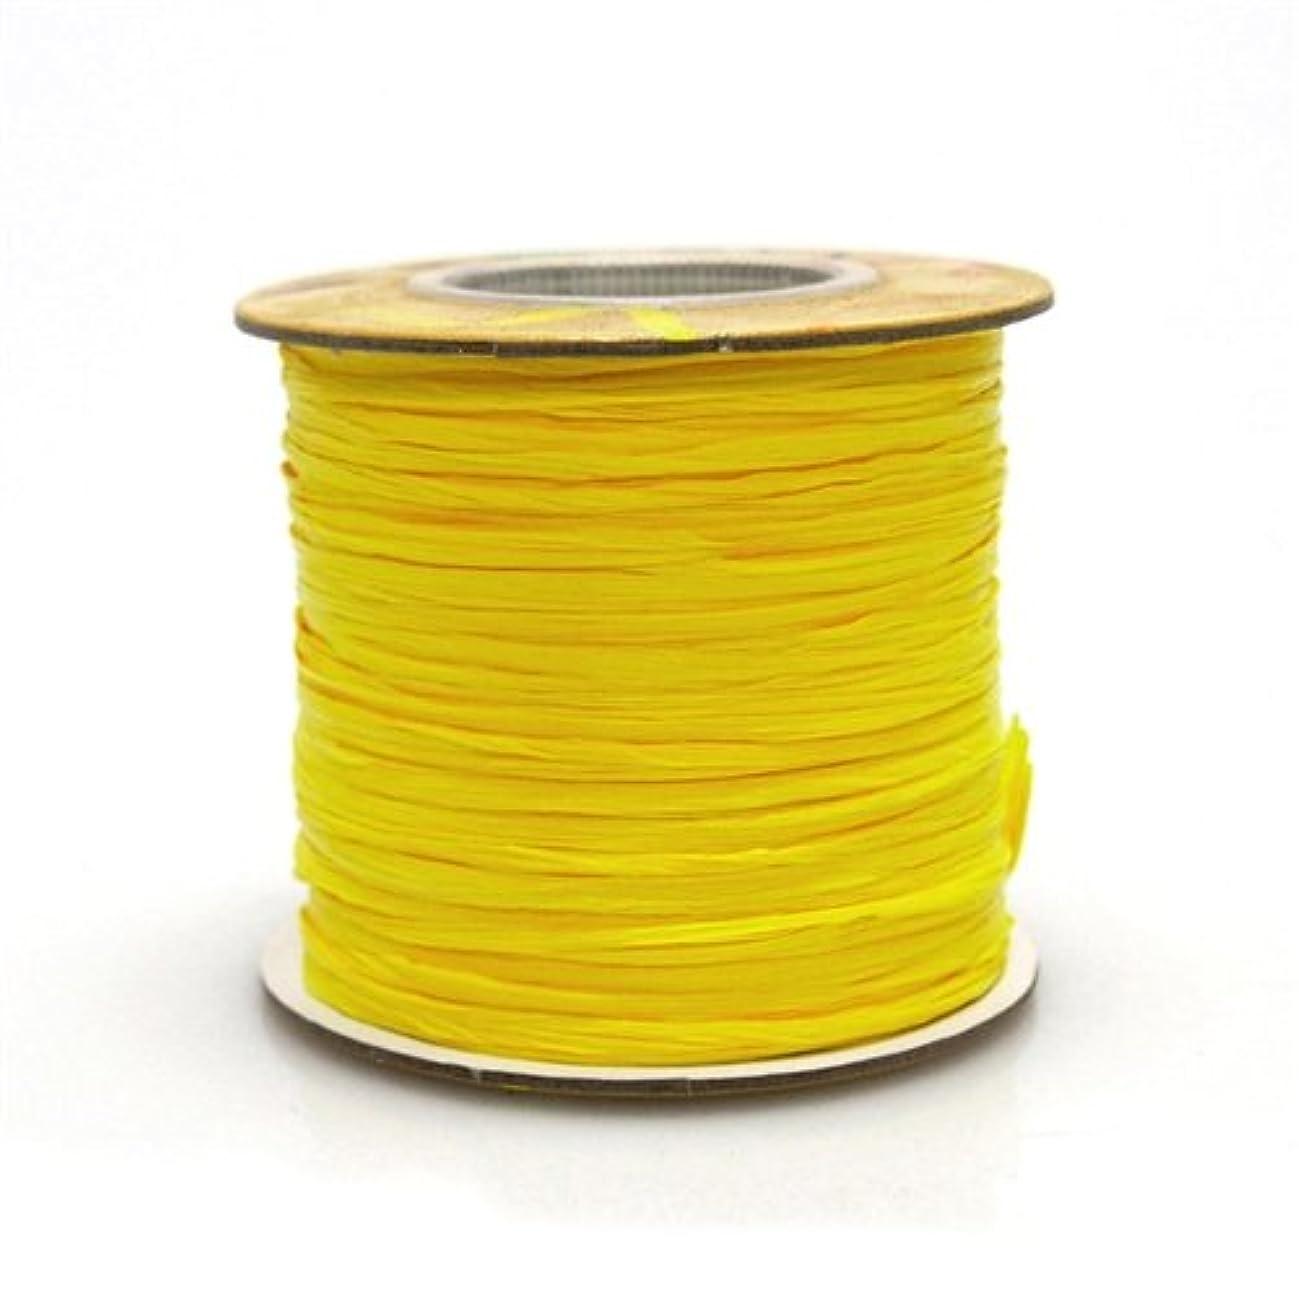 Homeford Firefly Imports Matte Raffia Ribbon, 1/4-Inch, 100 Yards, Yellow, 1/4